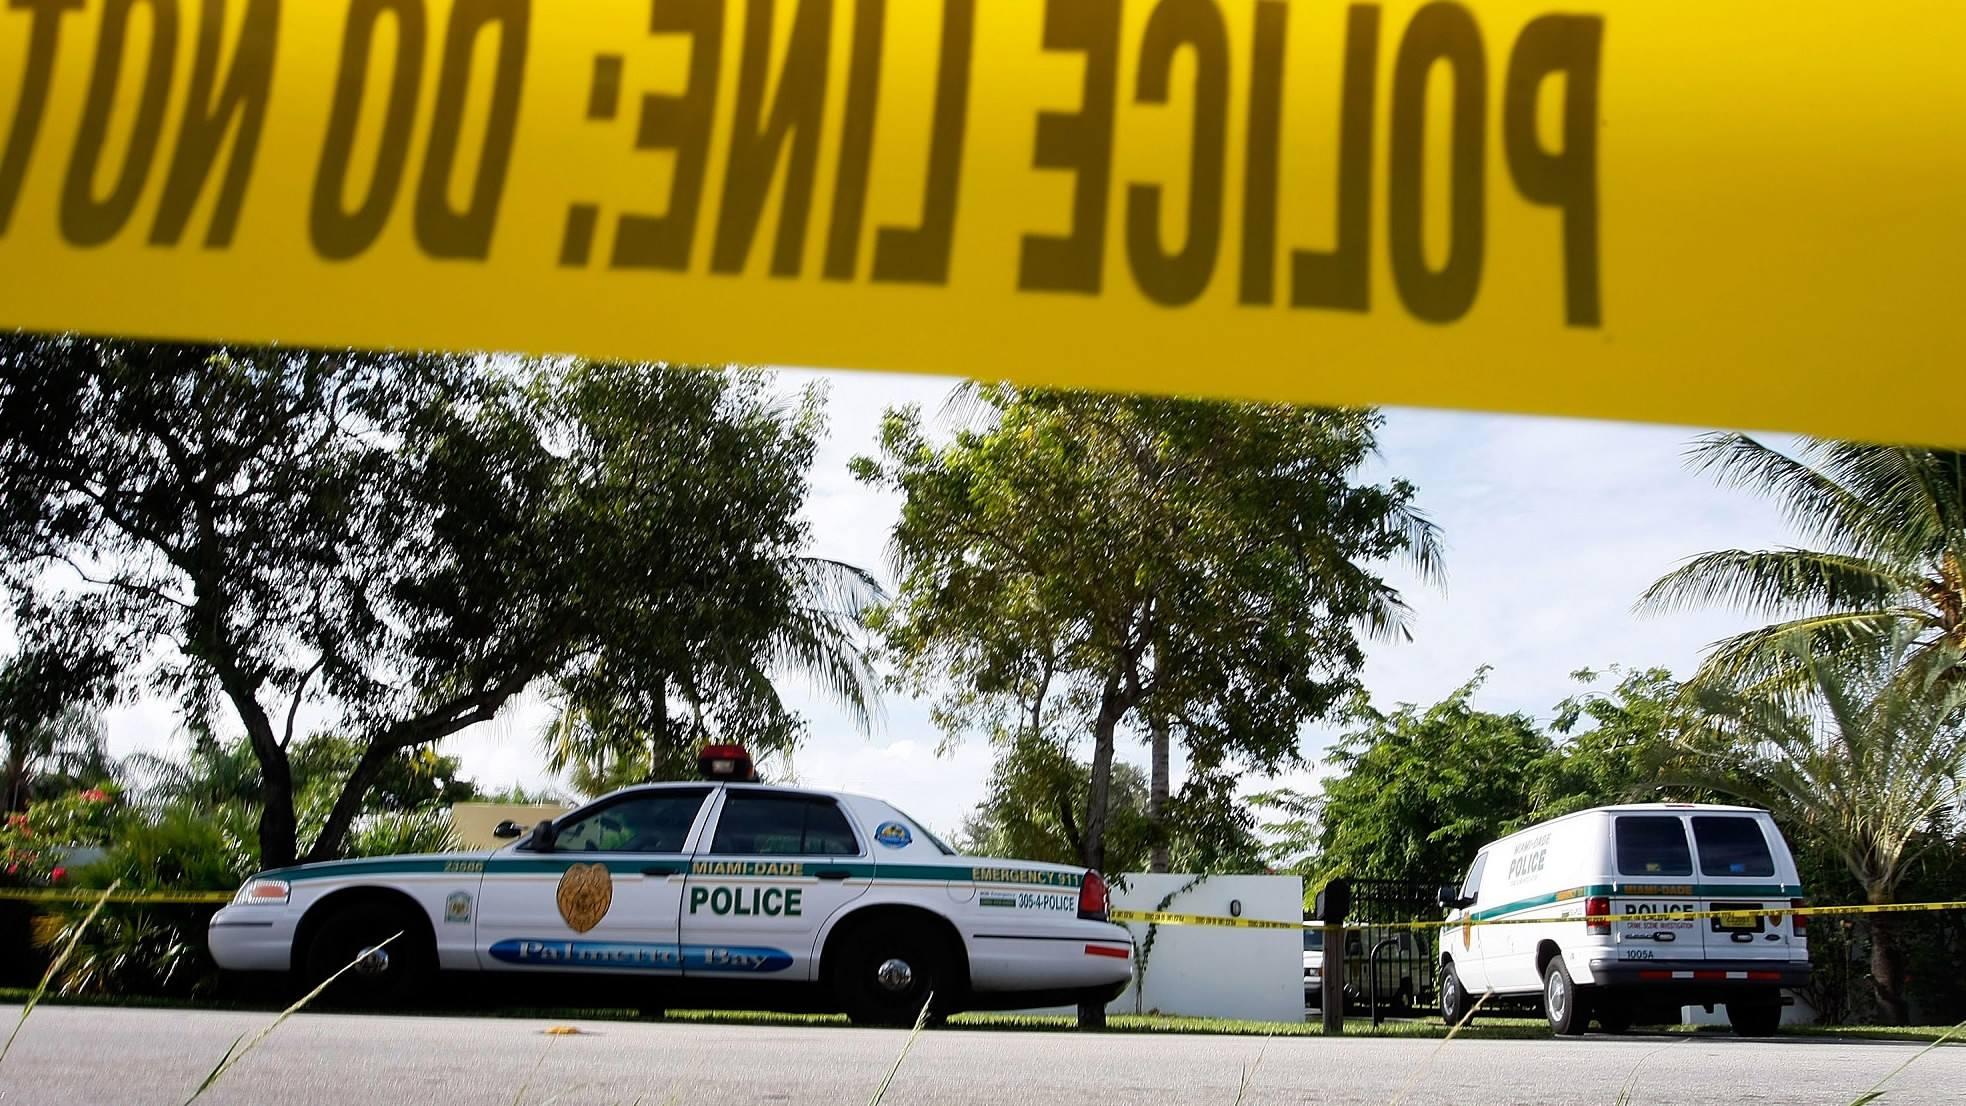 2 dead, 12 injured in North Carolina shooting